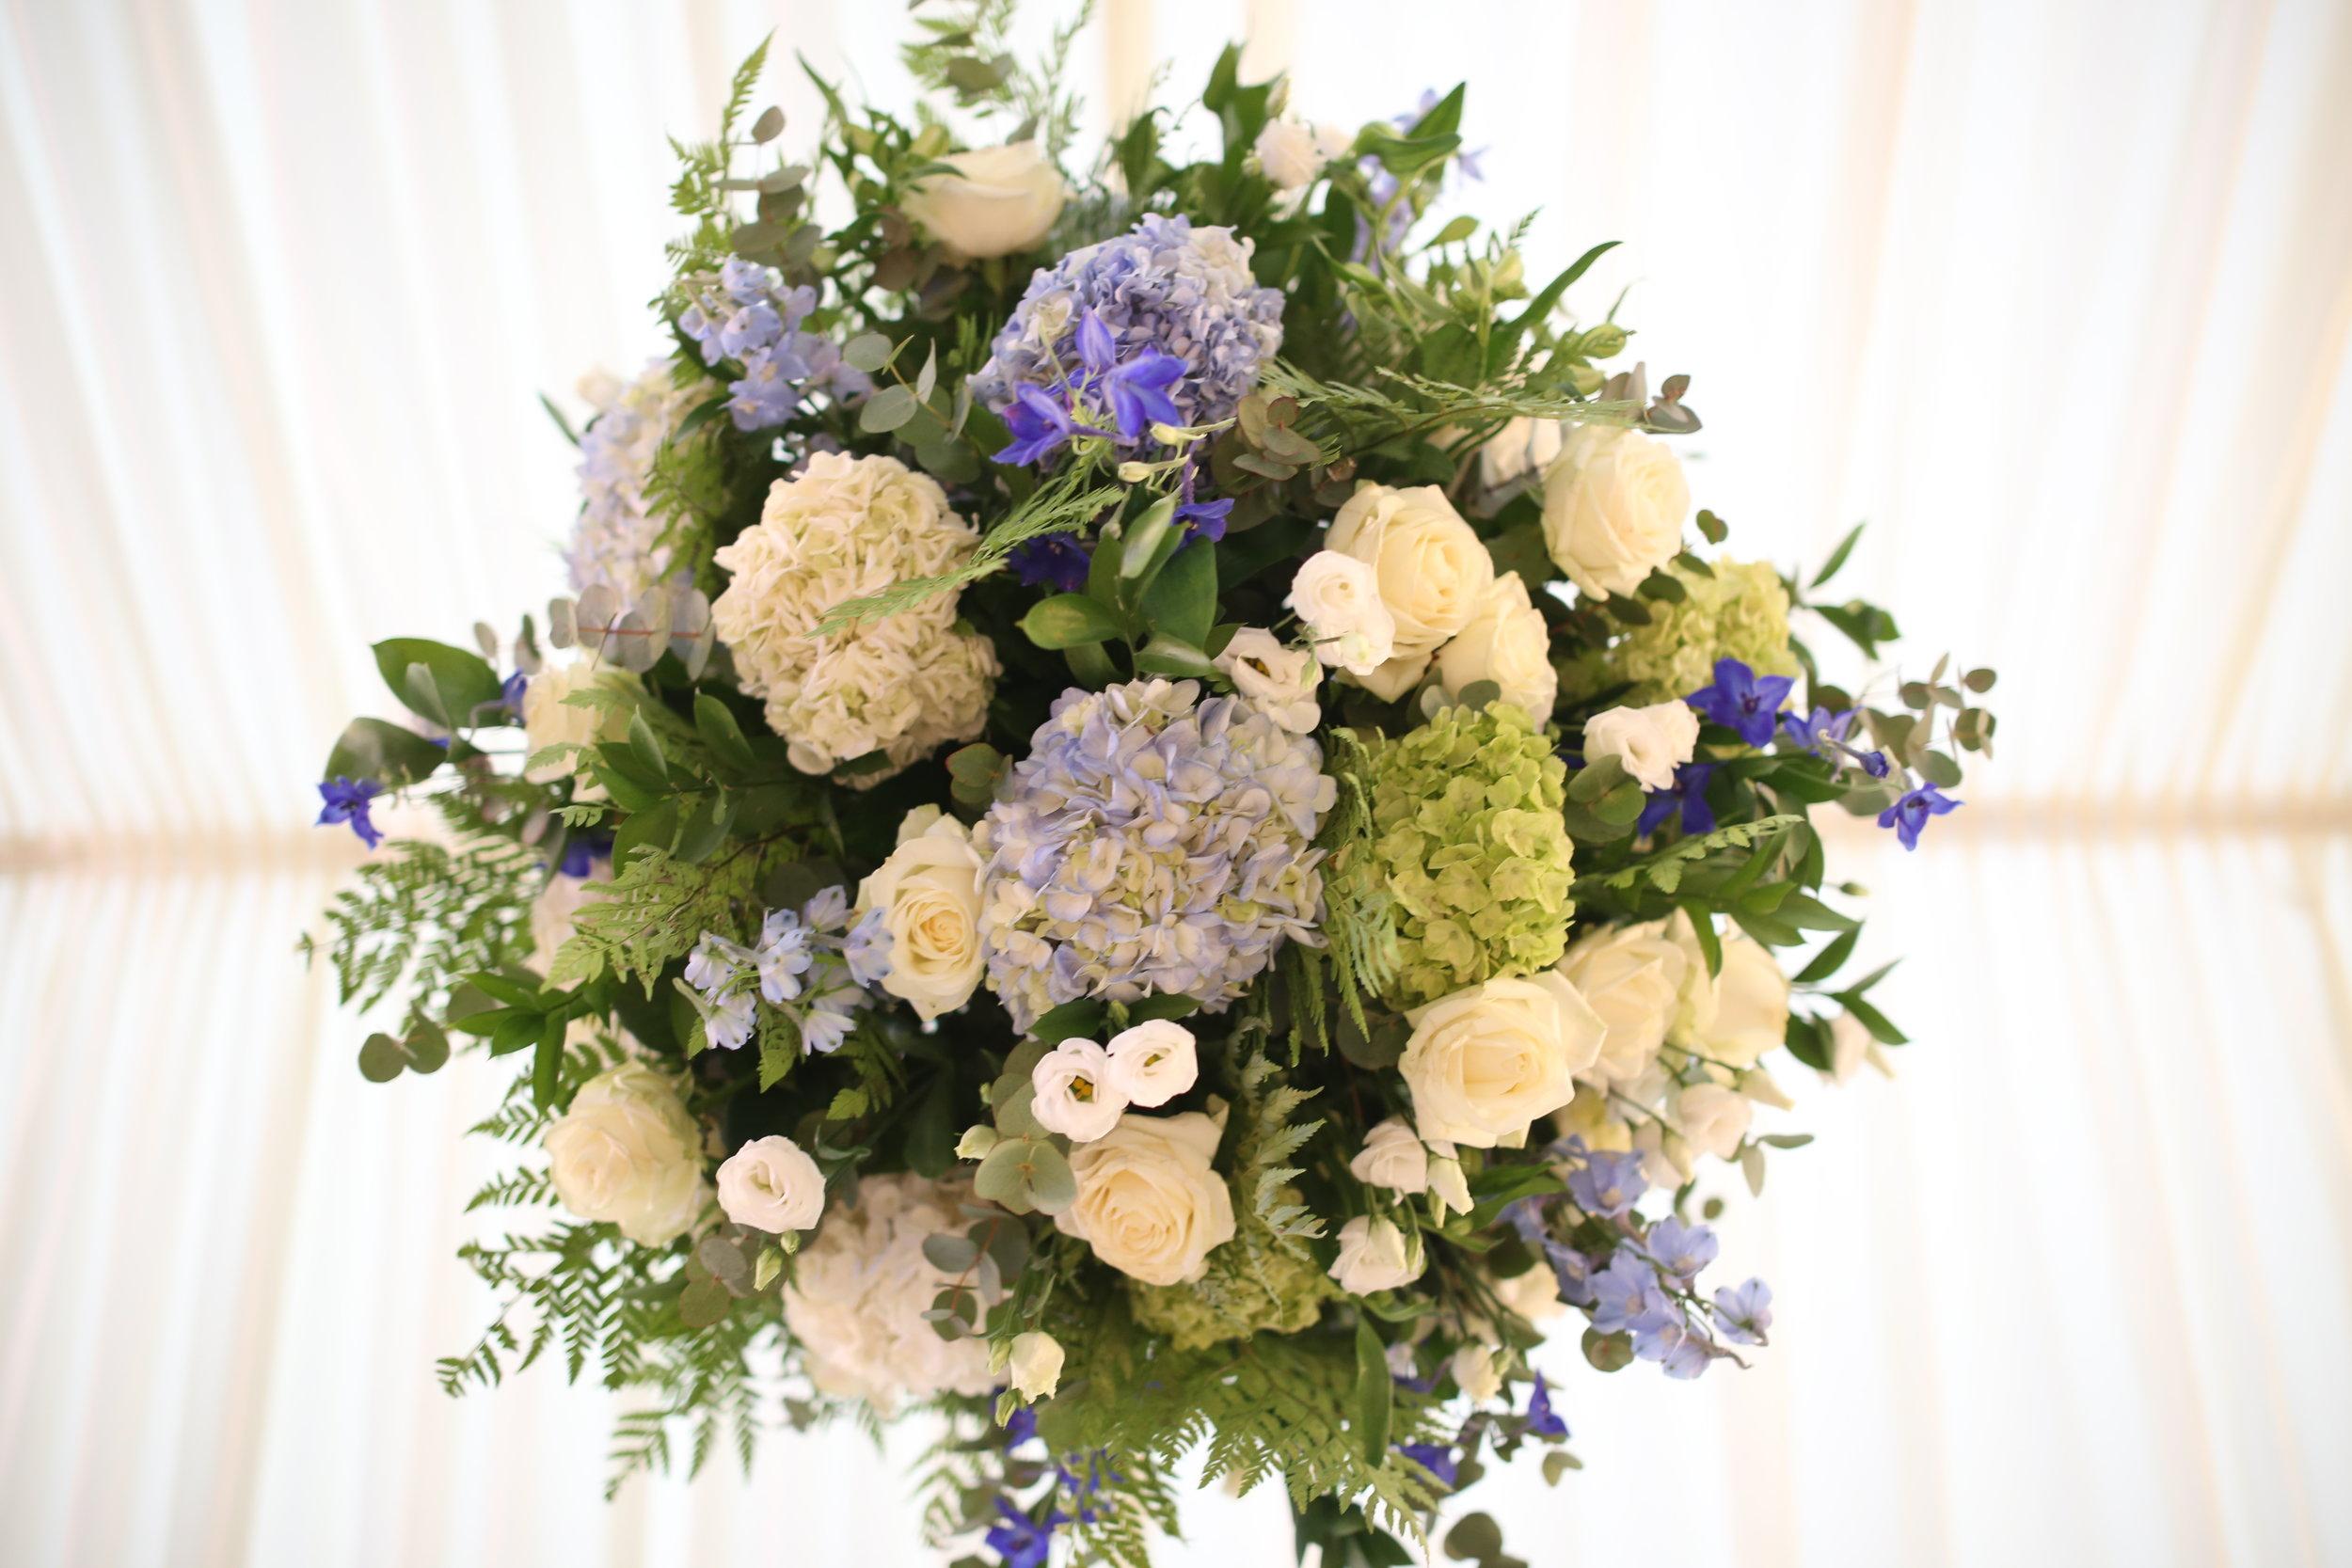 HANGING_CHANDALIER_BALL_HYDRANGEA_MARQUEE_MIRIAM_FAITH_WEDDING_FLOWERS_BLUE.JPG